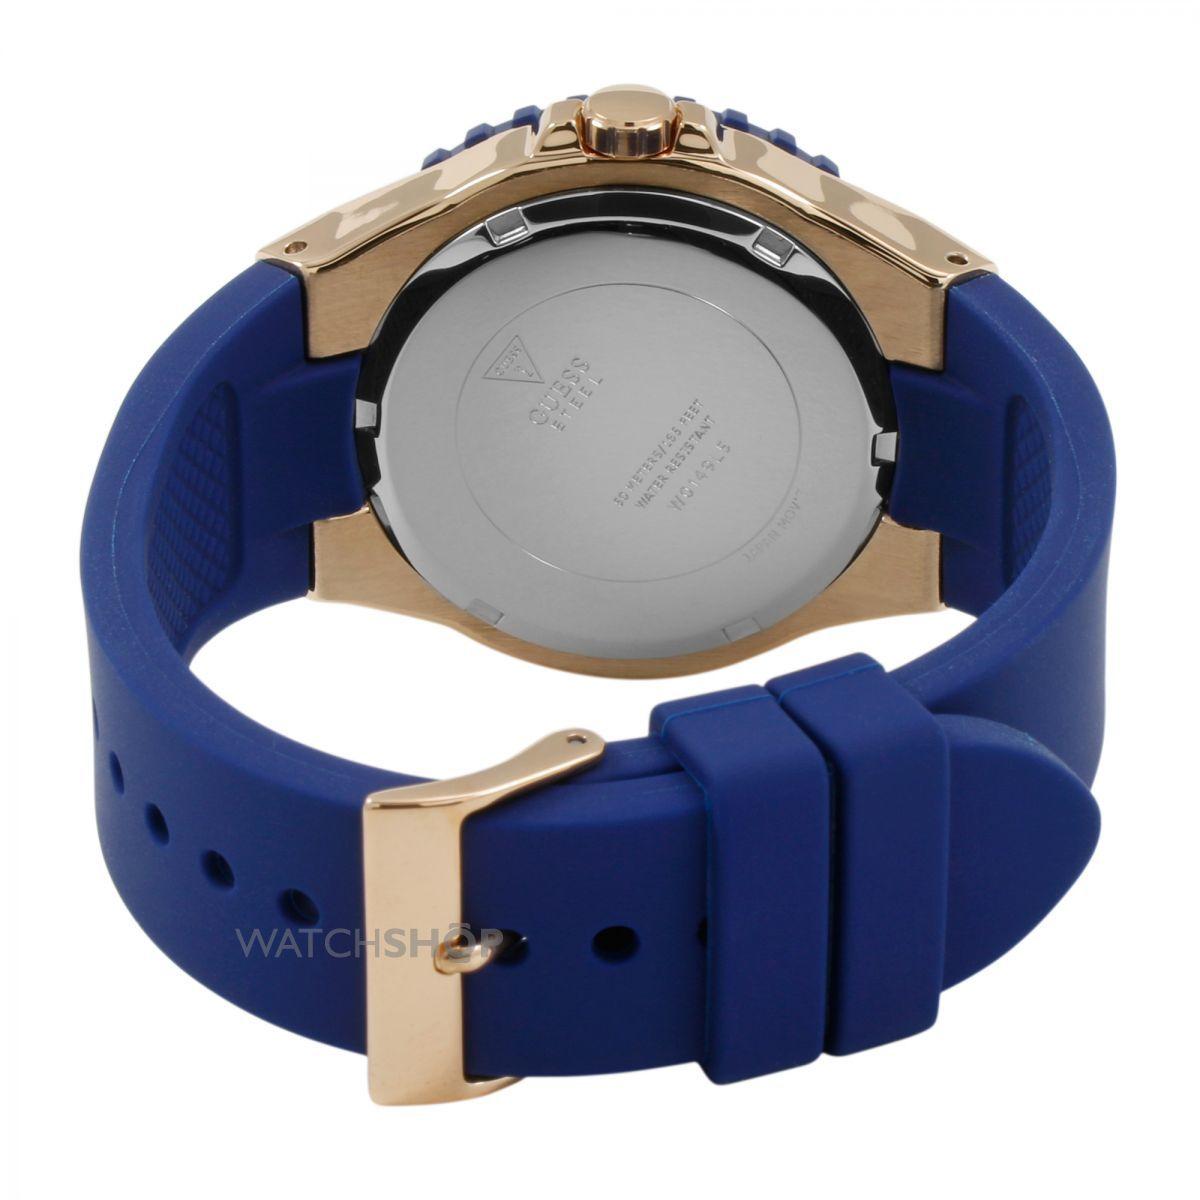 GUESS W0149L5 - купить наручные часы GUESS Iconic W0149L5 в интернет ... 0bc0be879041c